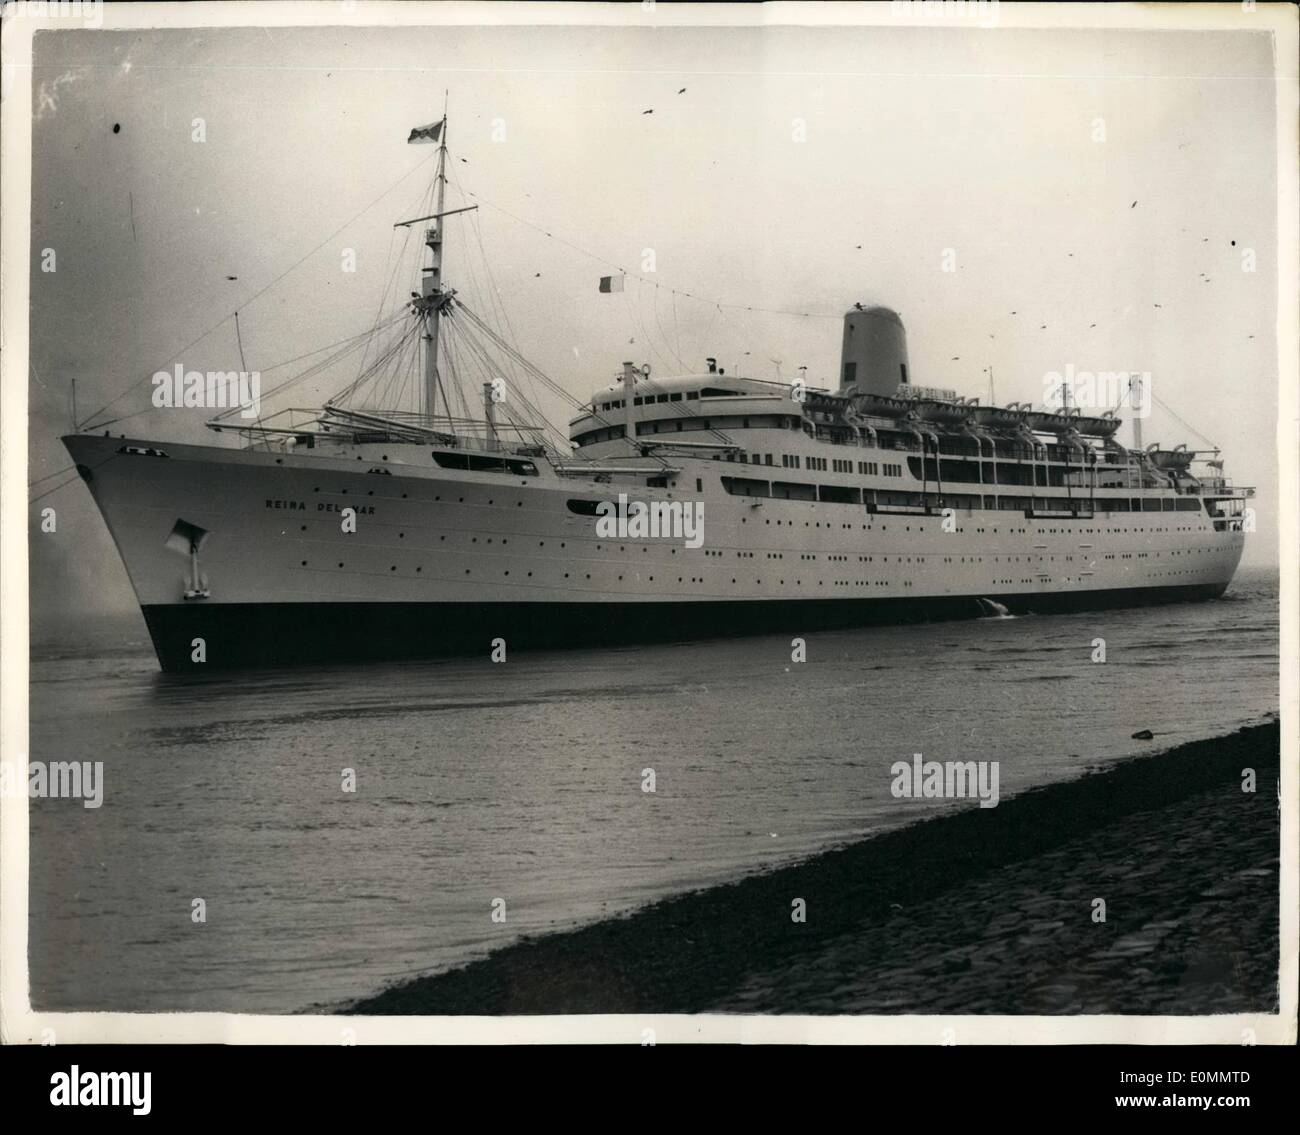 mar-03-1956-britains-latest-passenger-li